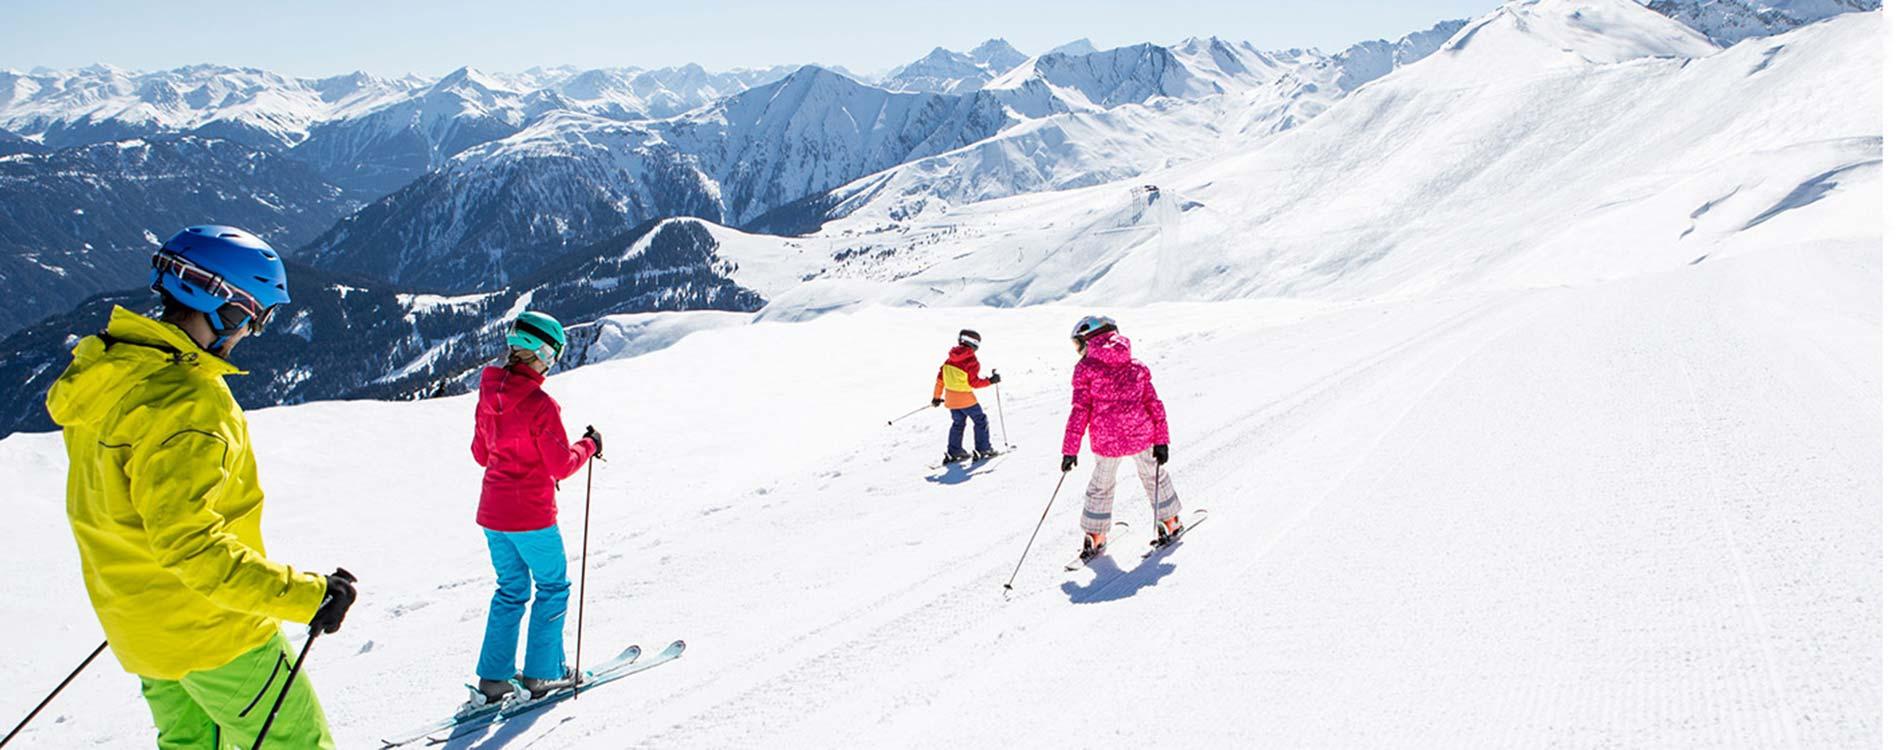 TVB Serfaus-Fiss-Ladis family skiing